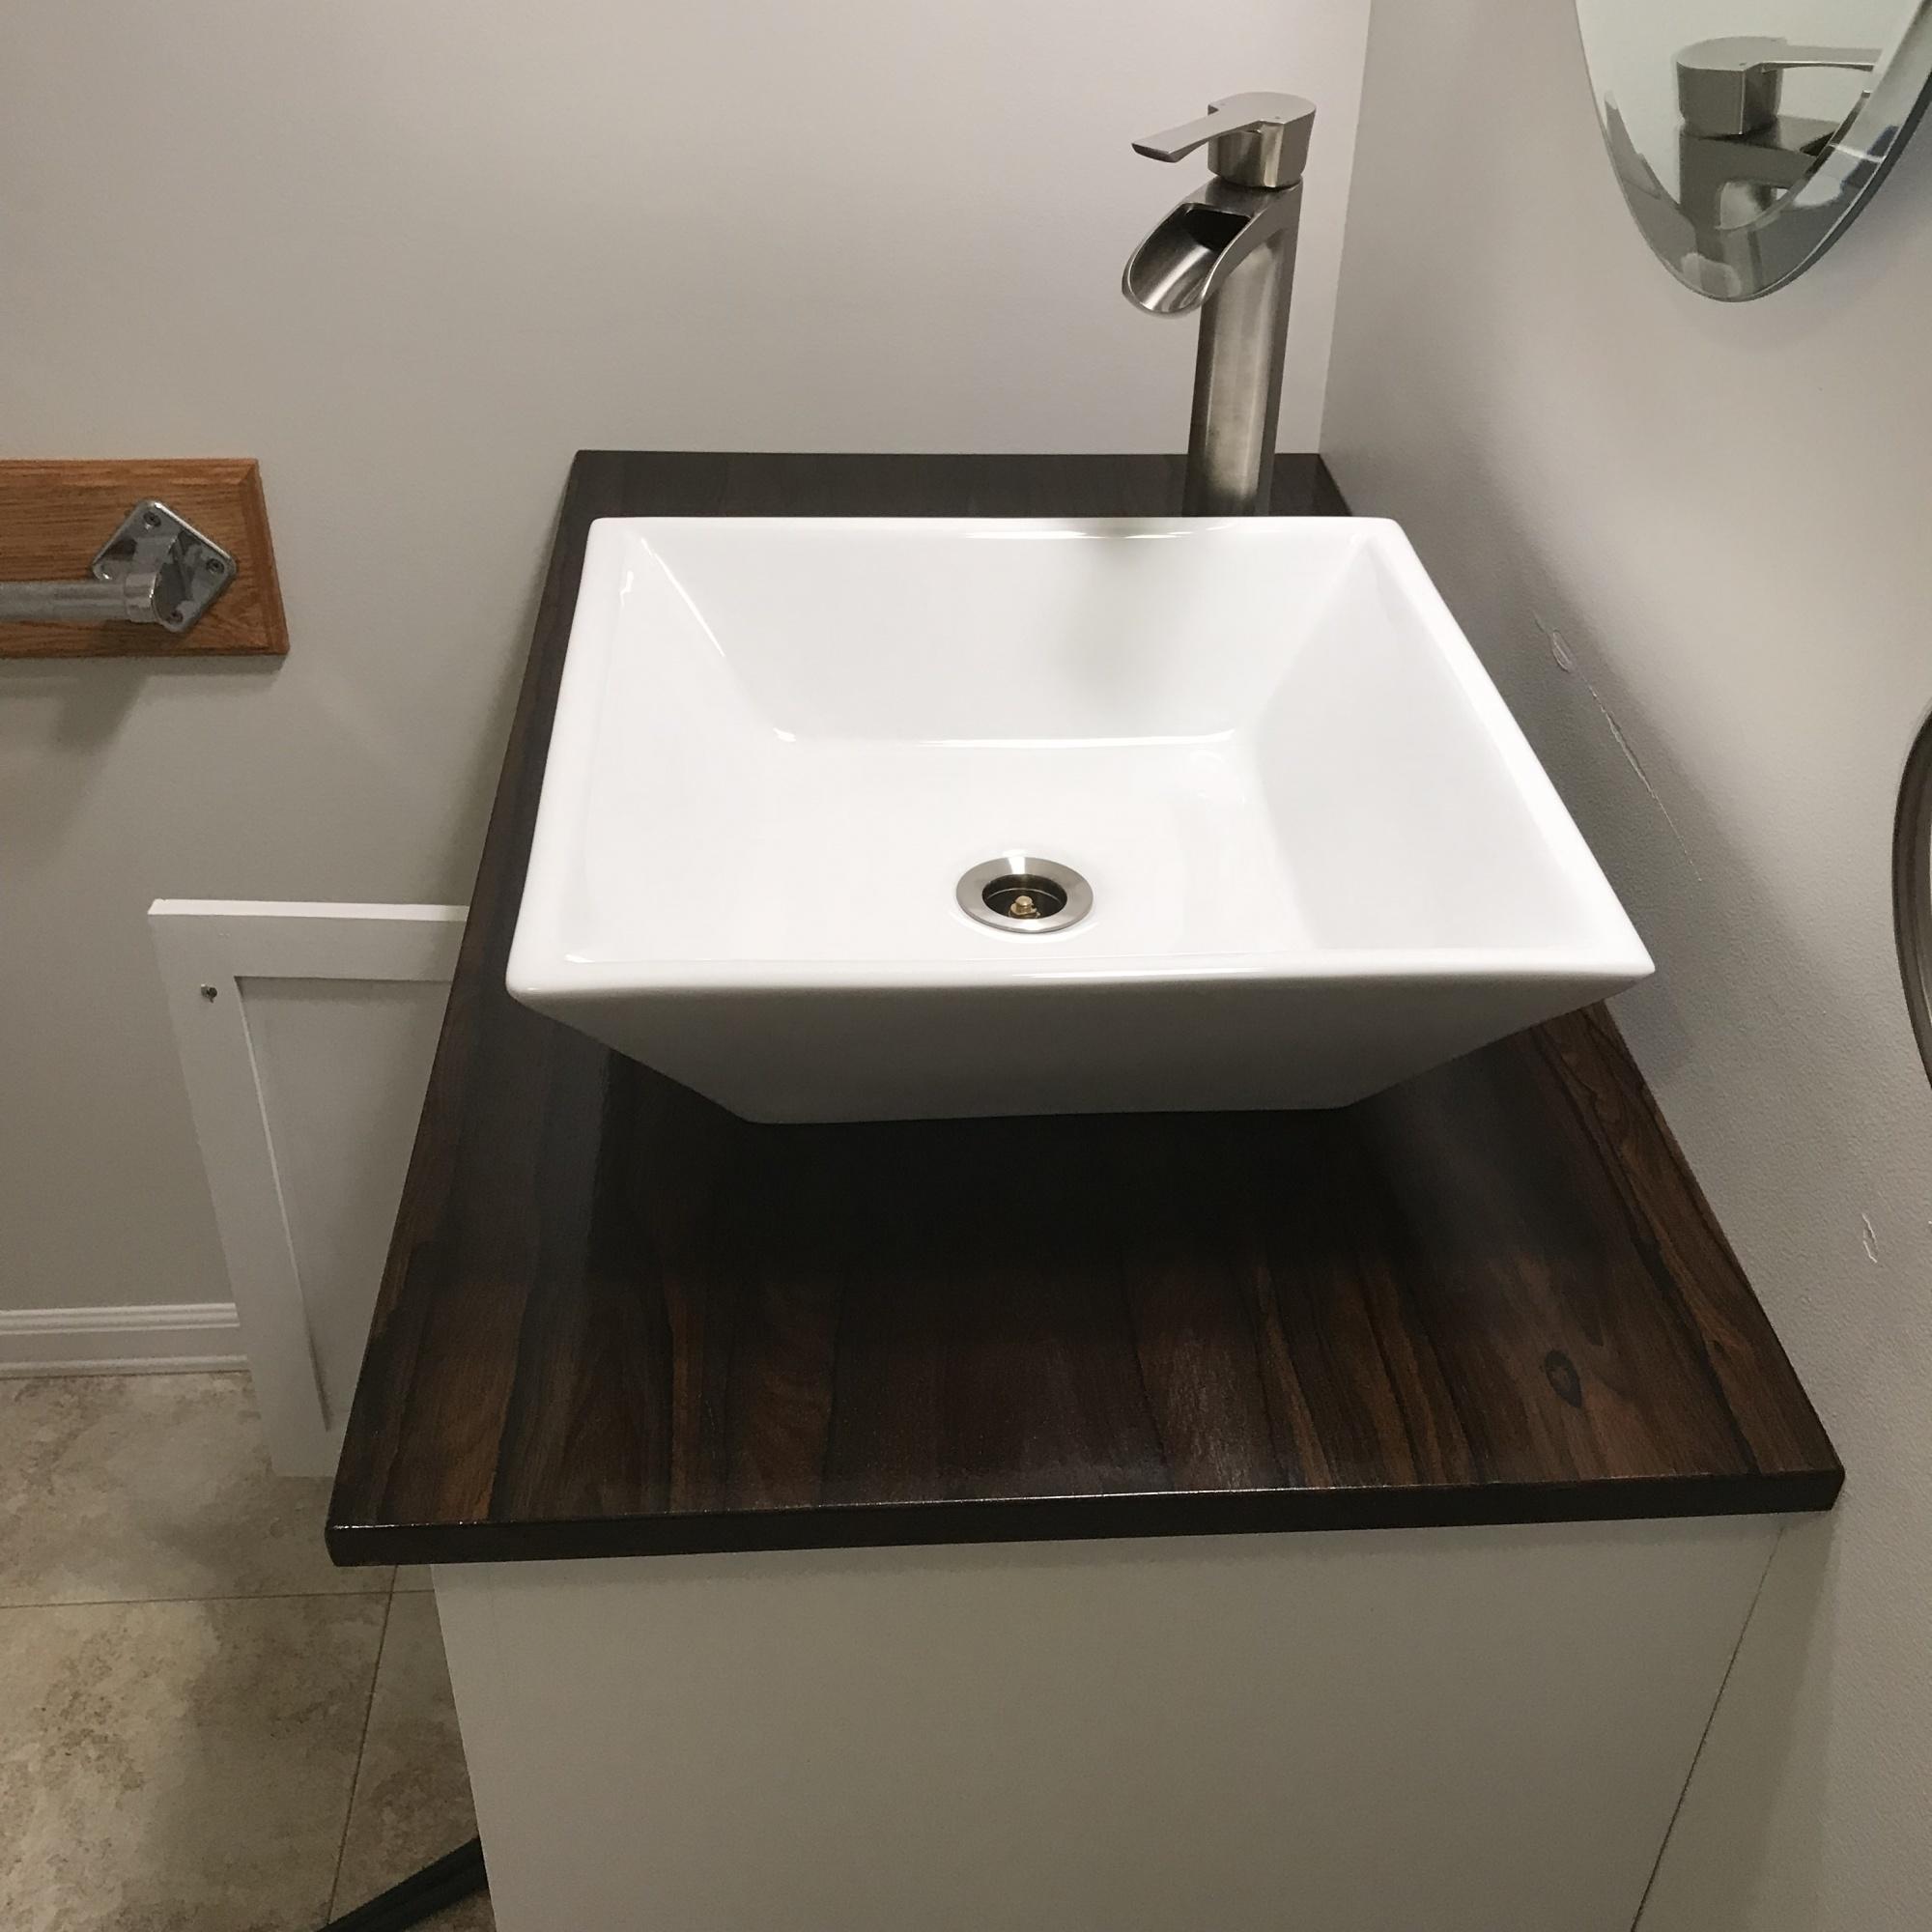 Drano Didn T Work Bathroom Sink: Zericote Vanity Top Under A Vessel Sink